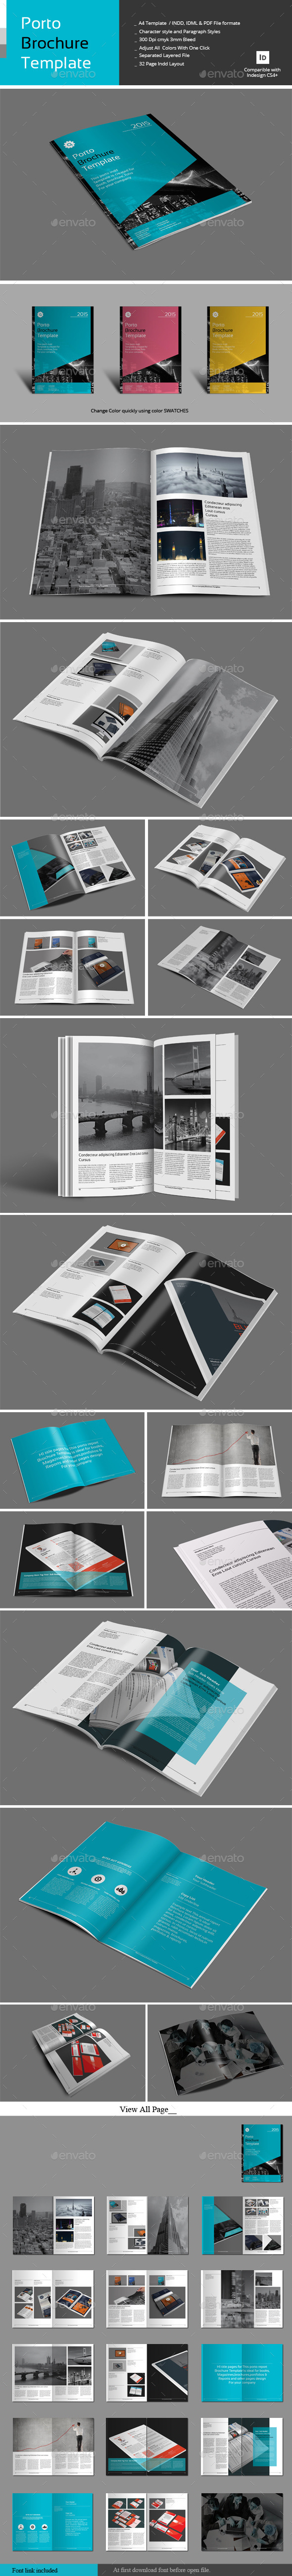 Porto Brochure Template - Corporate Brochures